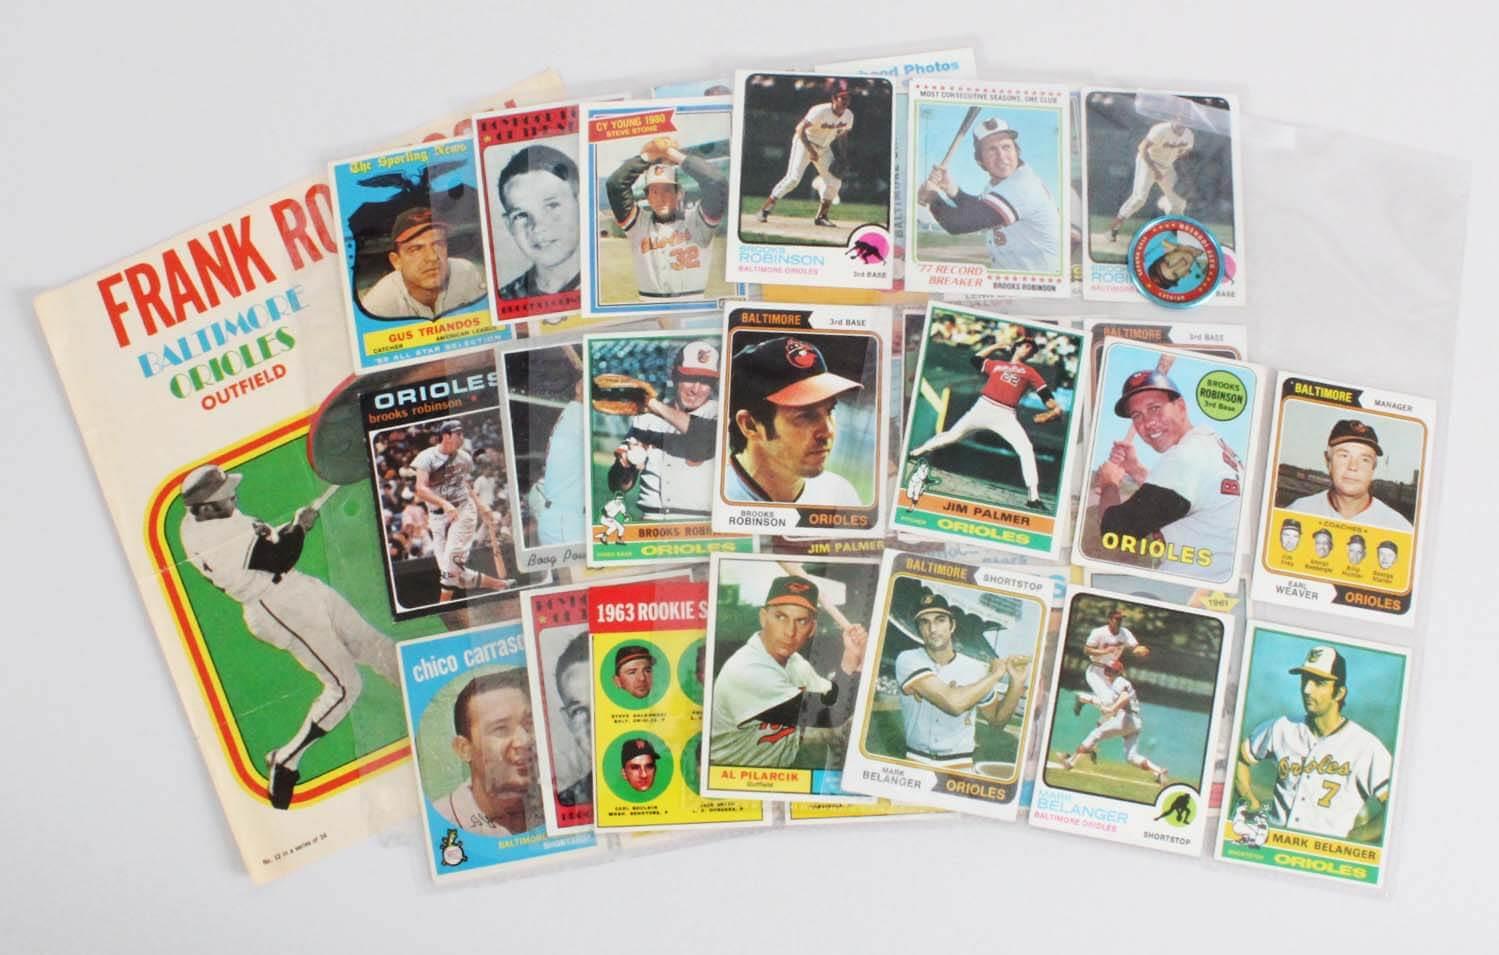 Baltimore Orioles Vintage Baseball Card Lot 42 Brooks Robinson Jim Palmer Etc